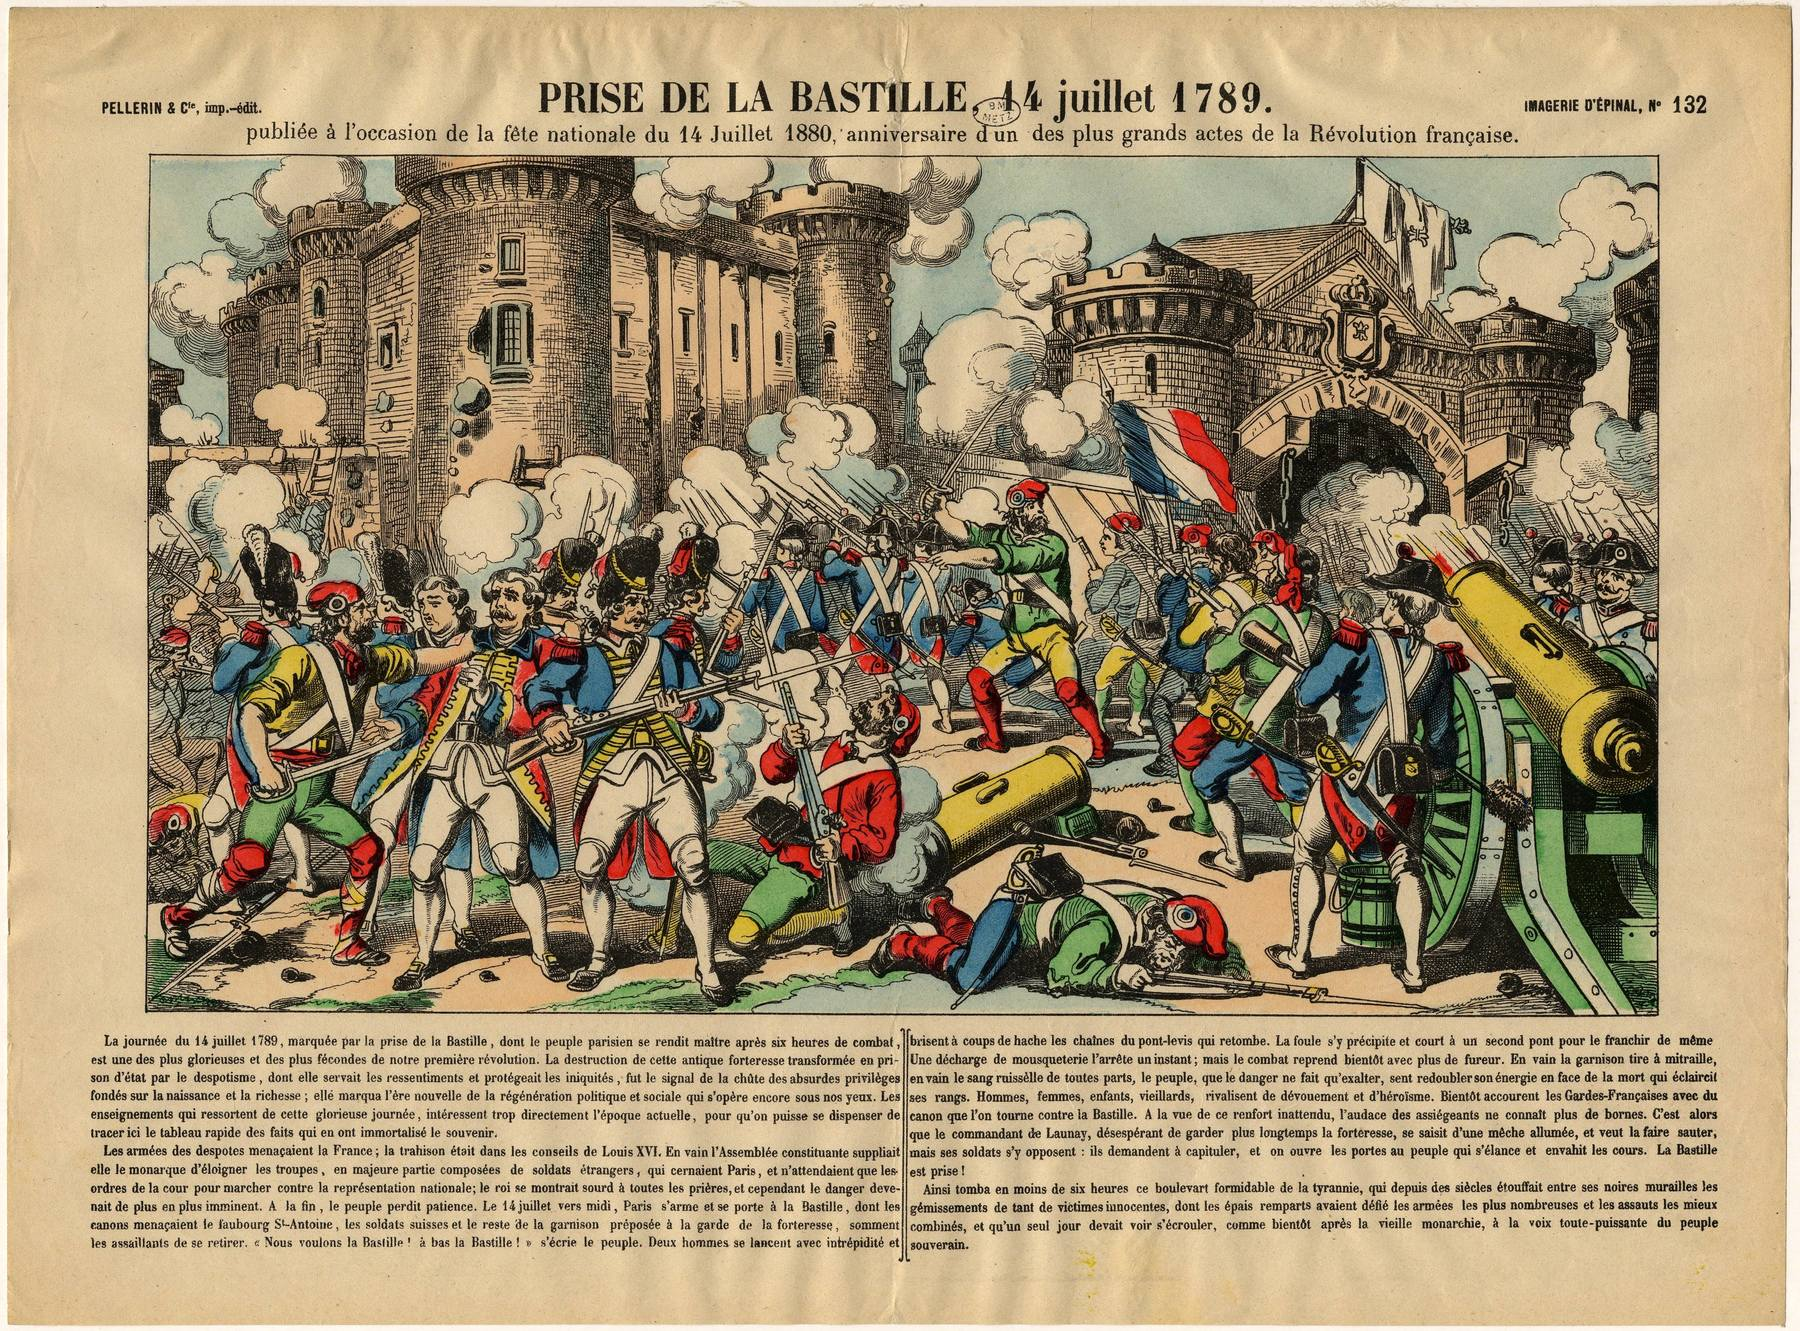 Contenu du Estampe de la Prise de la Bastille